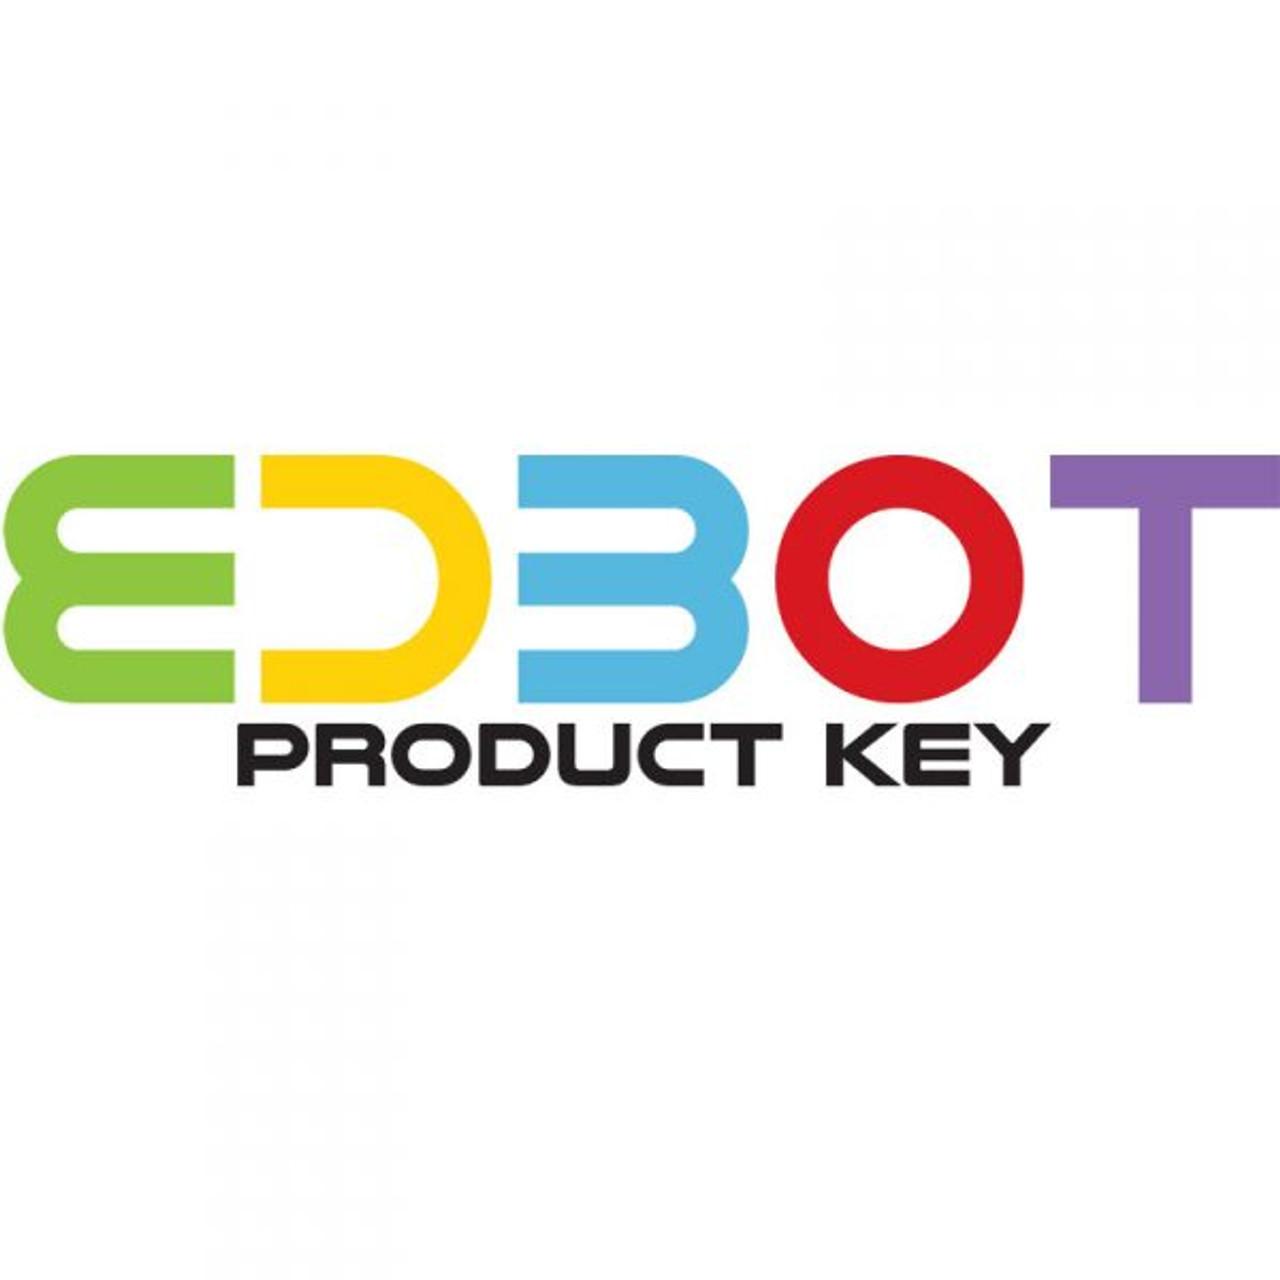 Edbot Software Product Key - ROBOTIS MINI